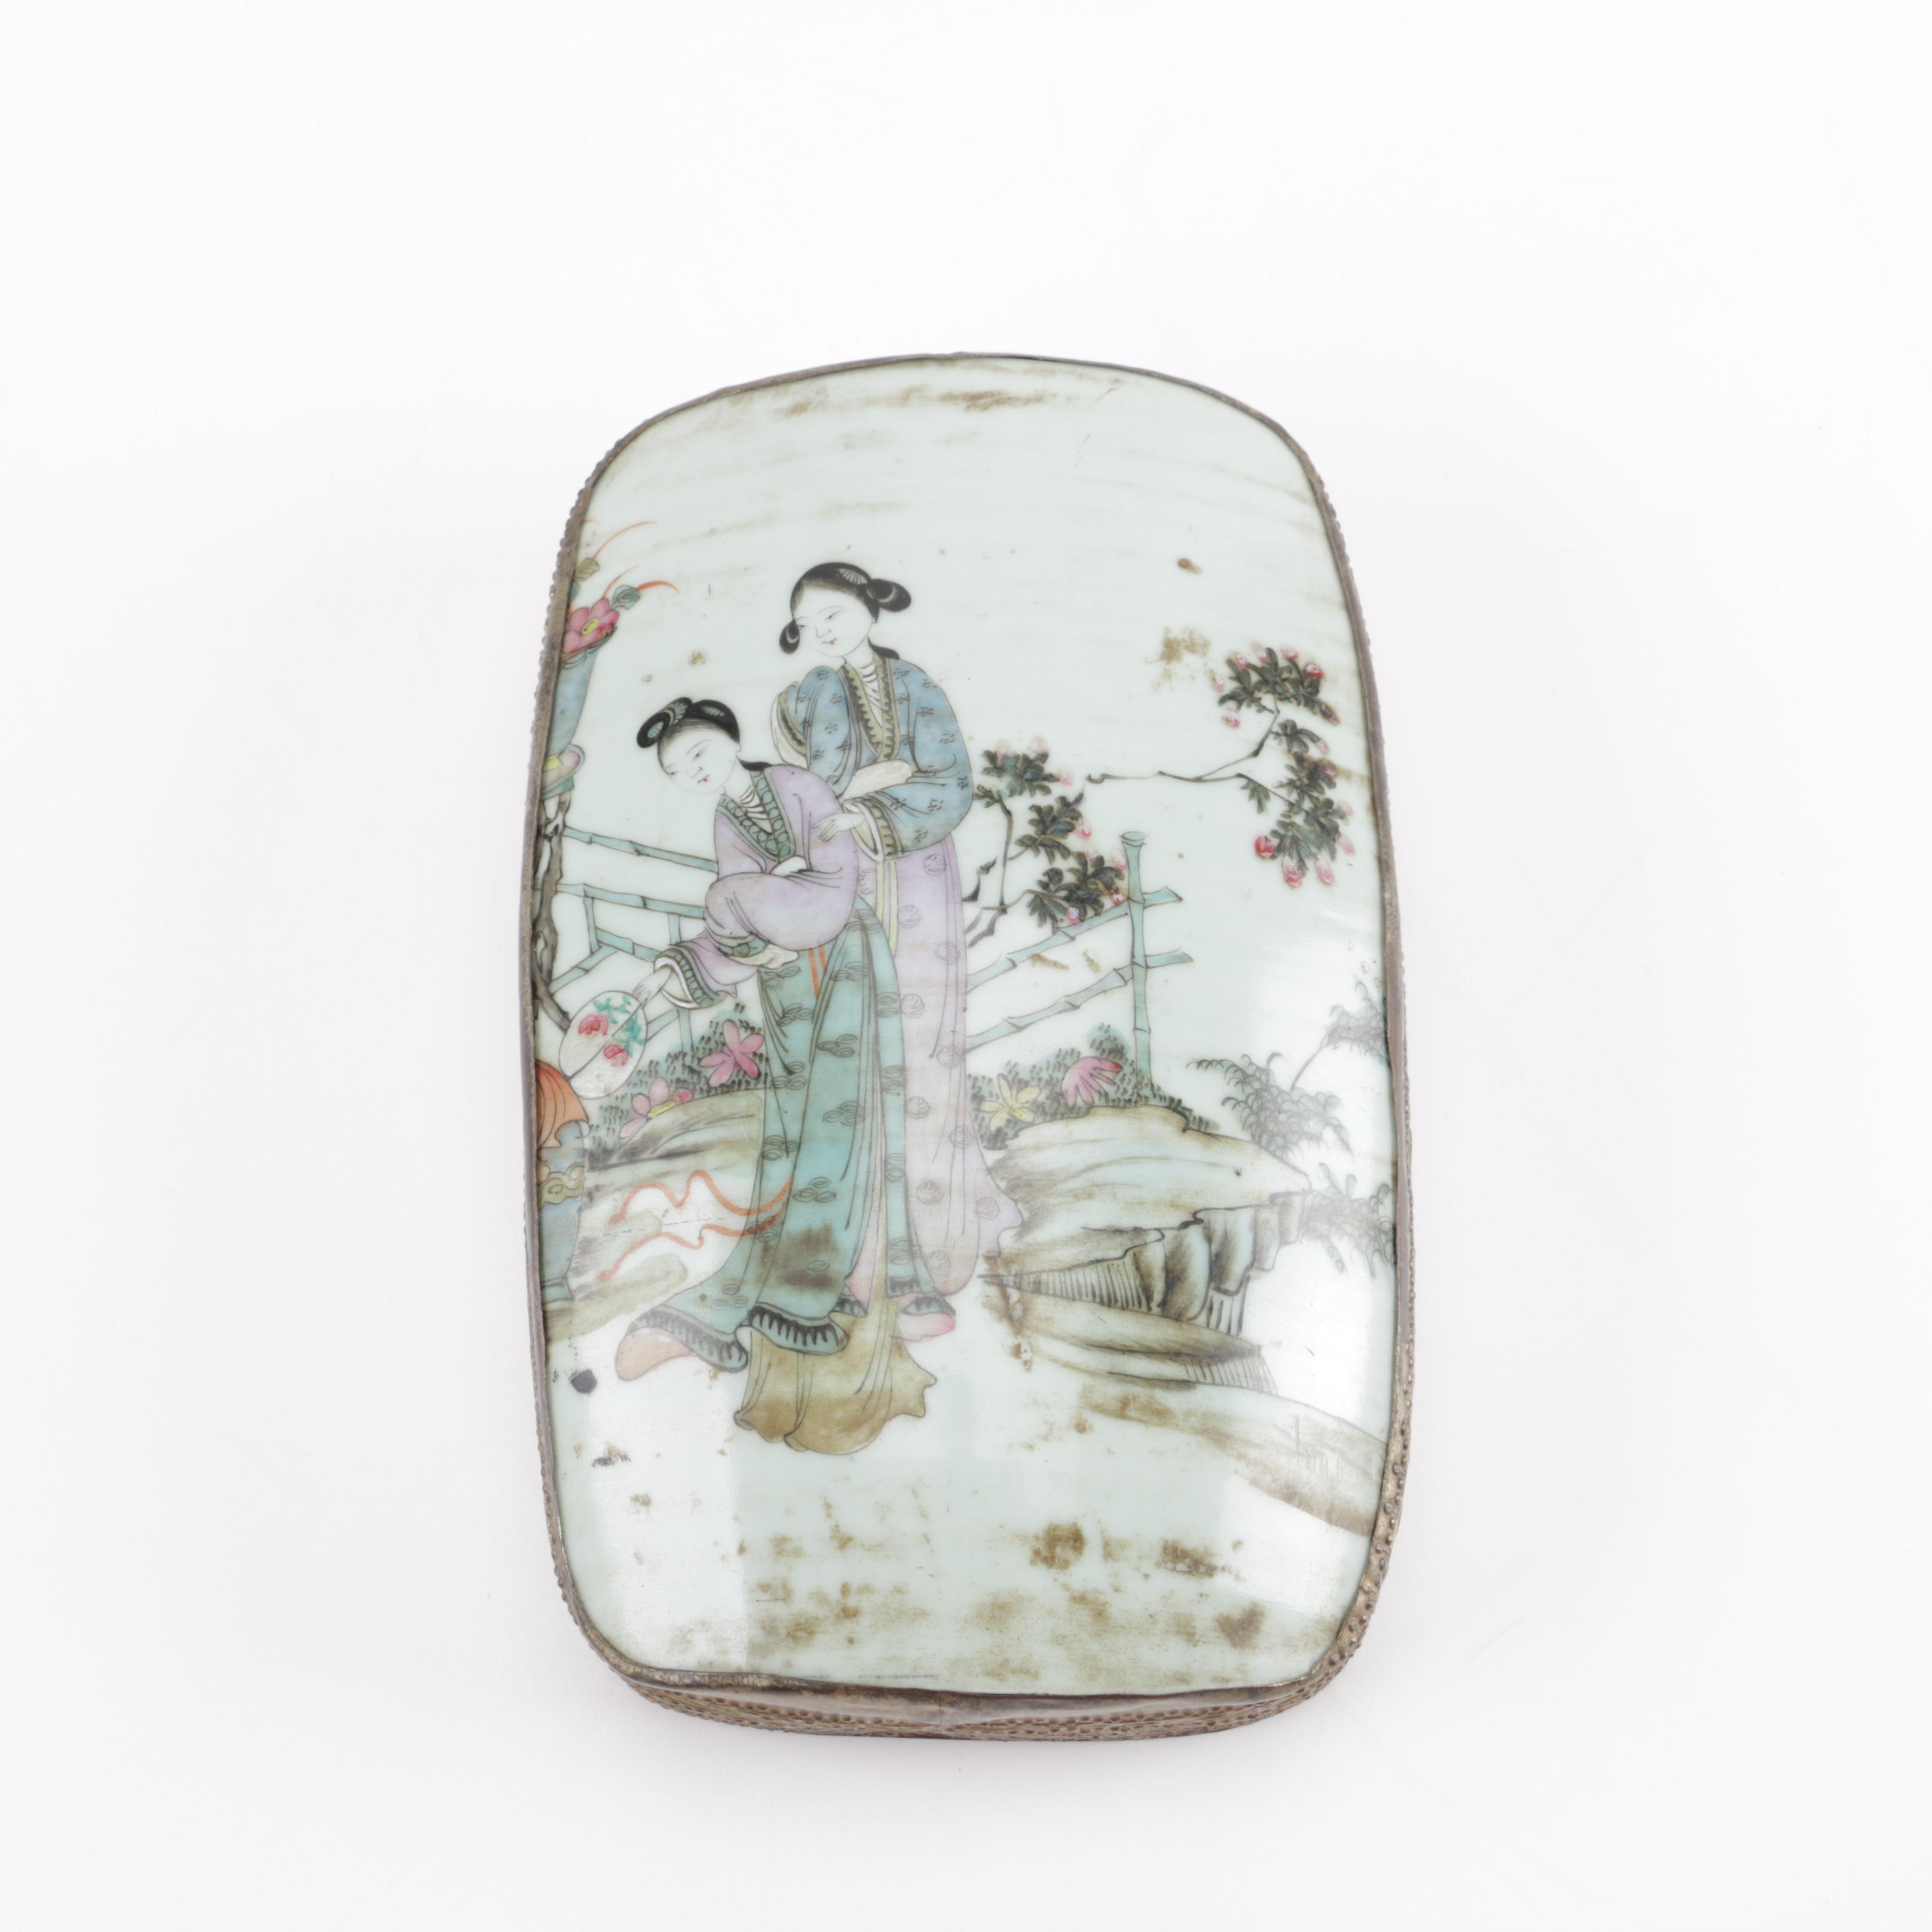 Chinese Porcelain Shard Figural Trinket Box